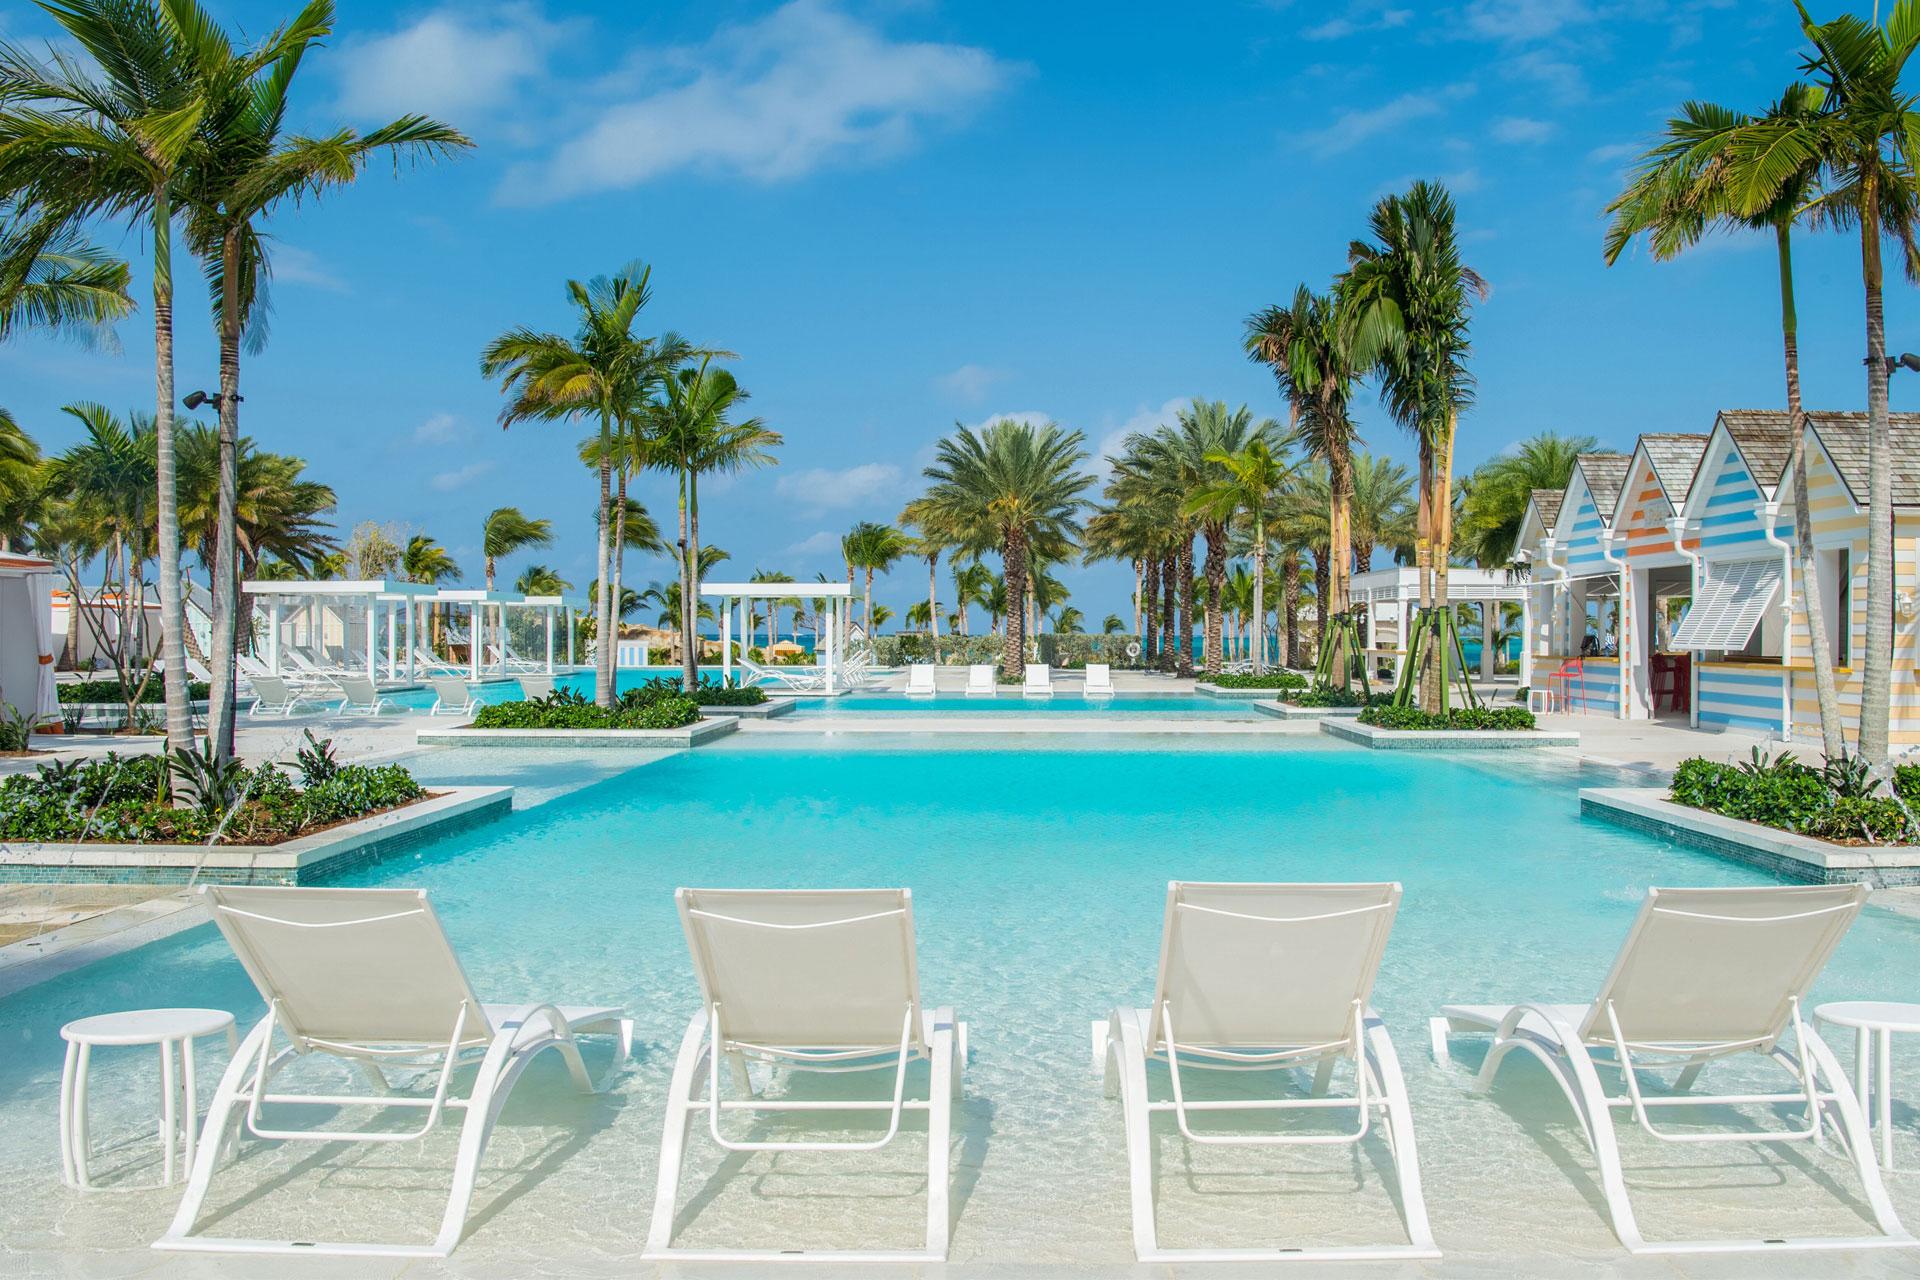 Baha Mar Drift Pool; Courtesy of Baha Mar Resort